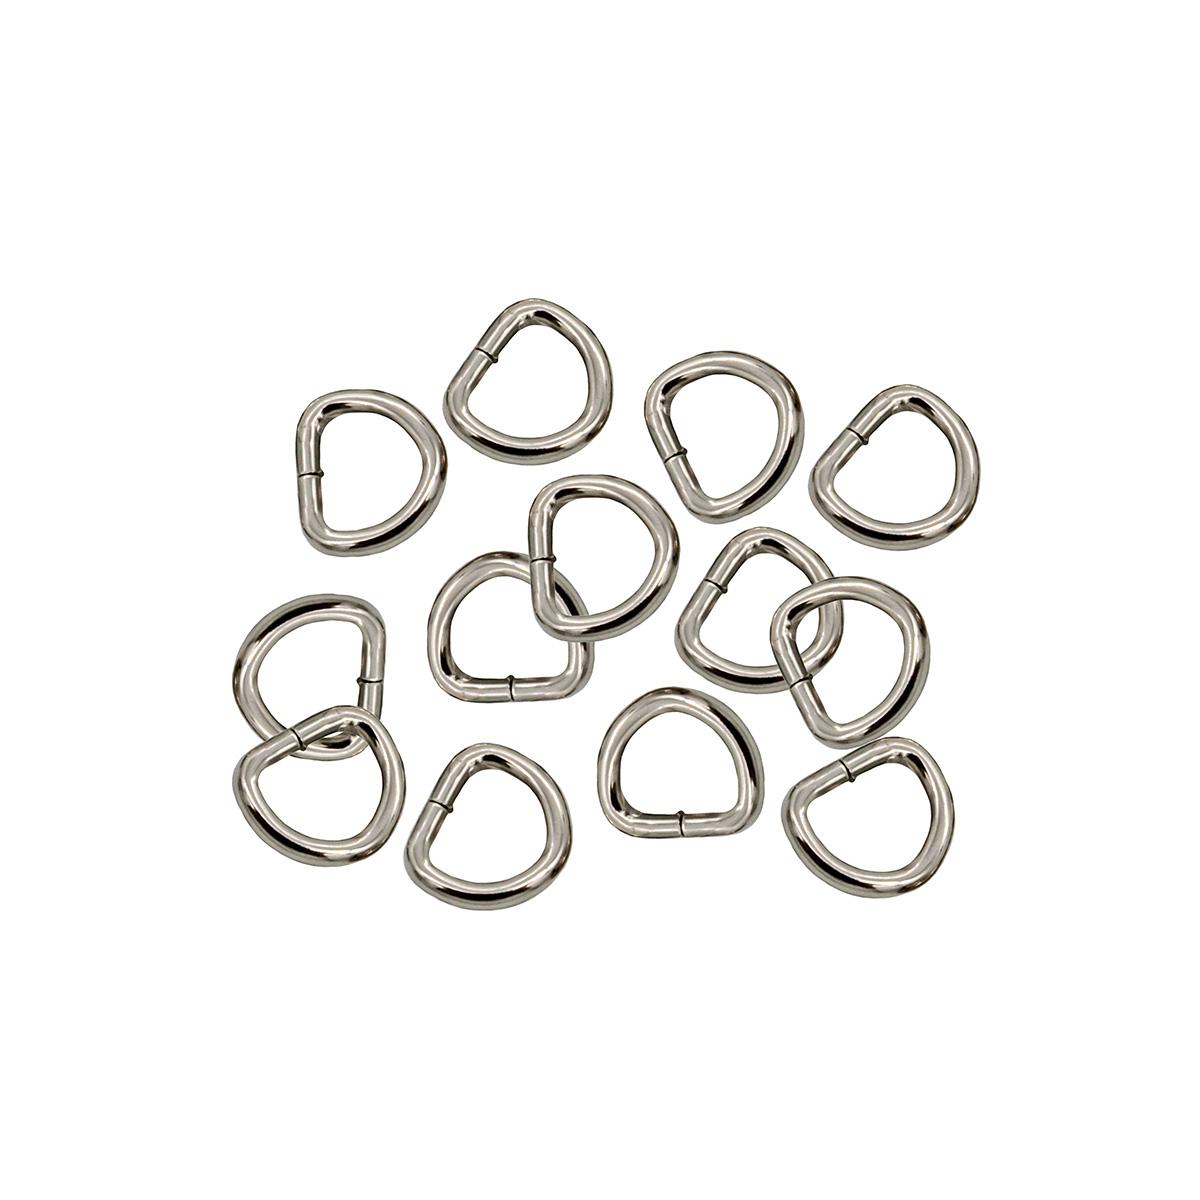 27285 Полукольцо мини 9*8мм уп. 20 шт, цв.серебро